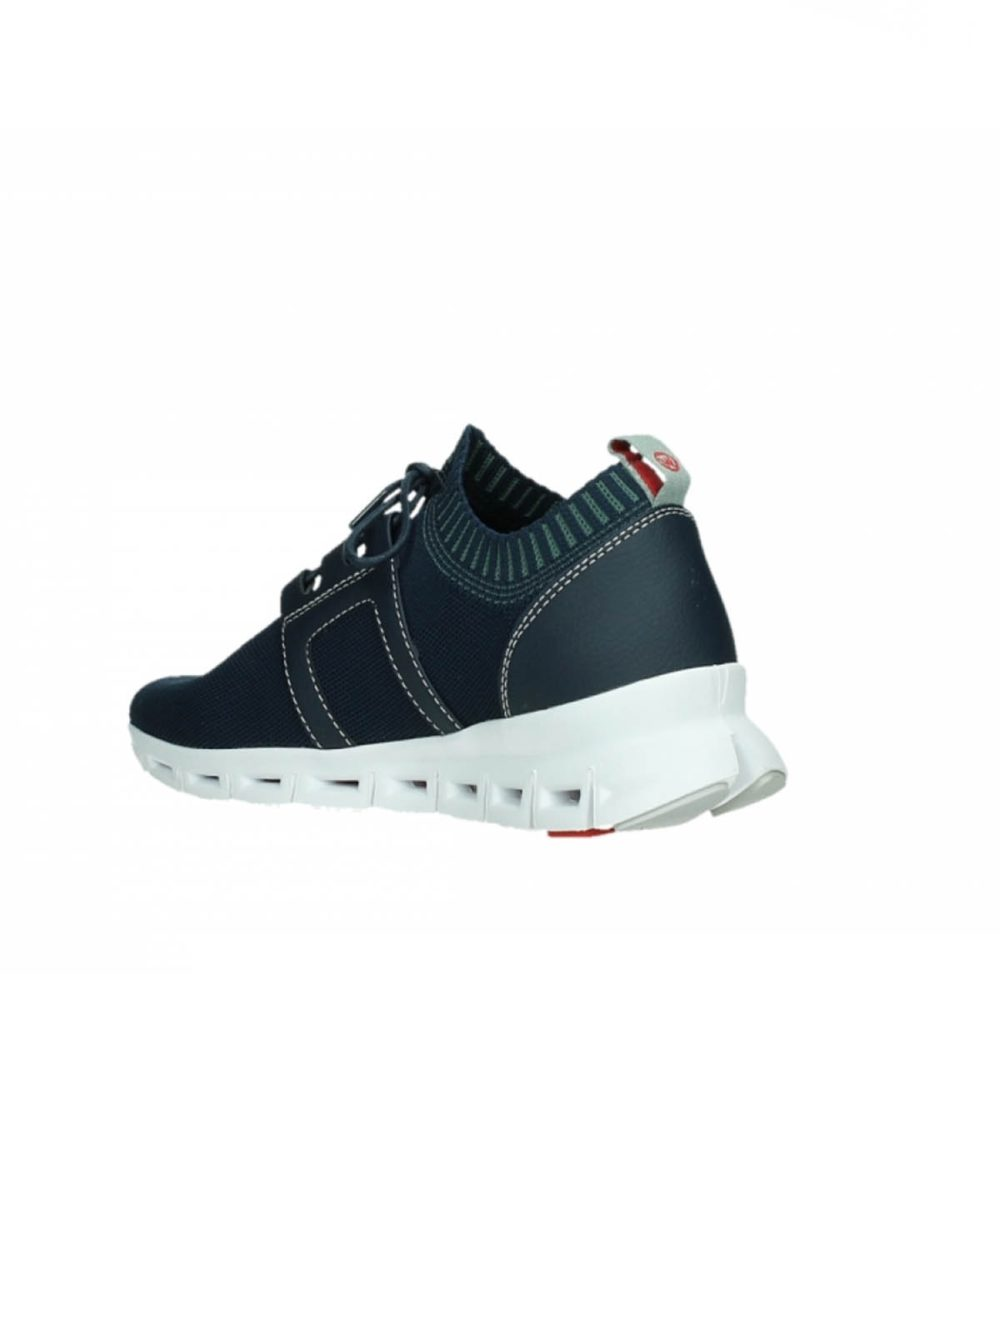 Tera Shoe Wolky Shoes Katie Kerr Women's Shoes